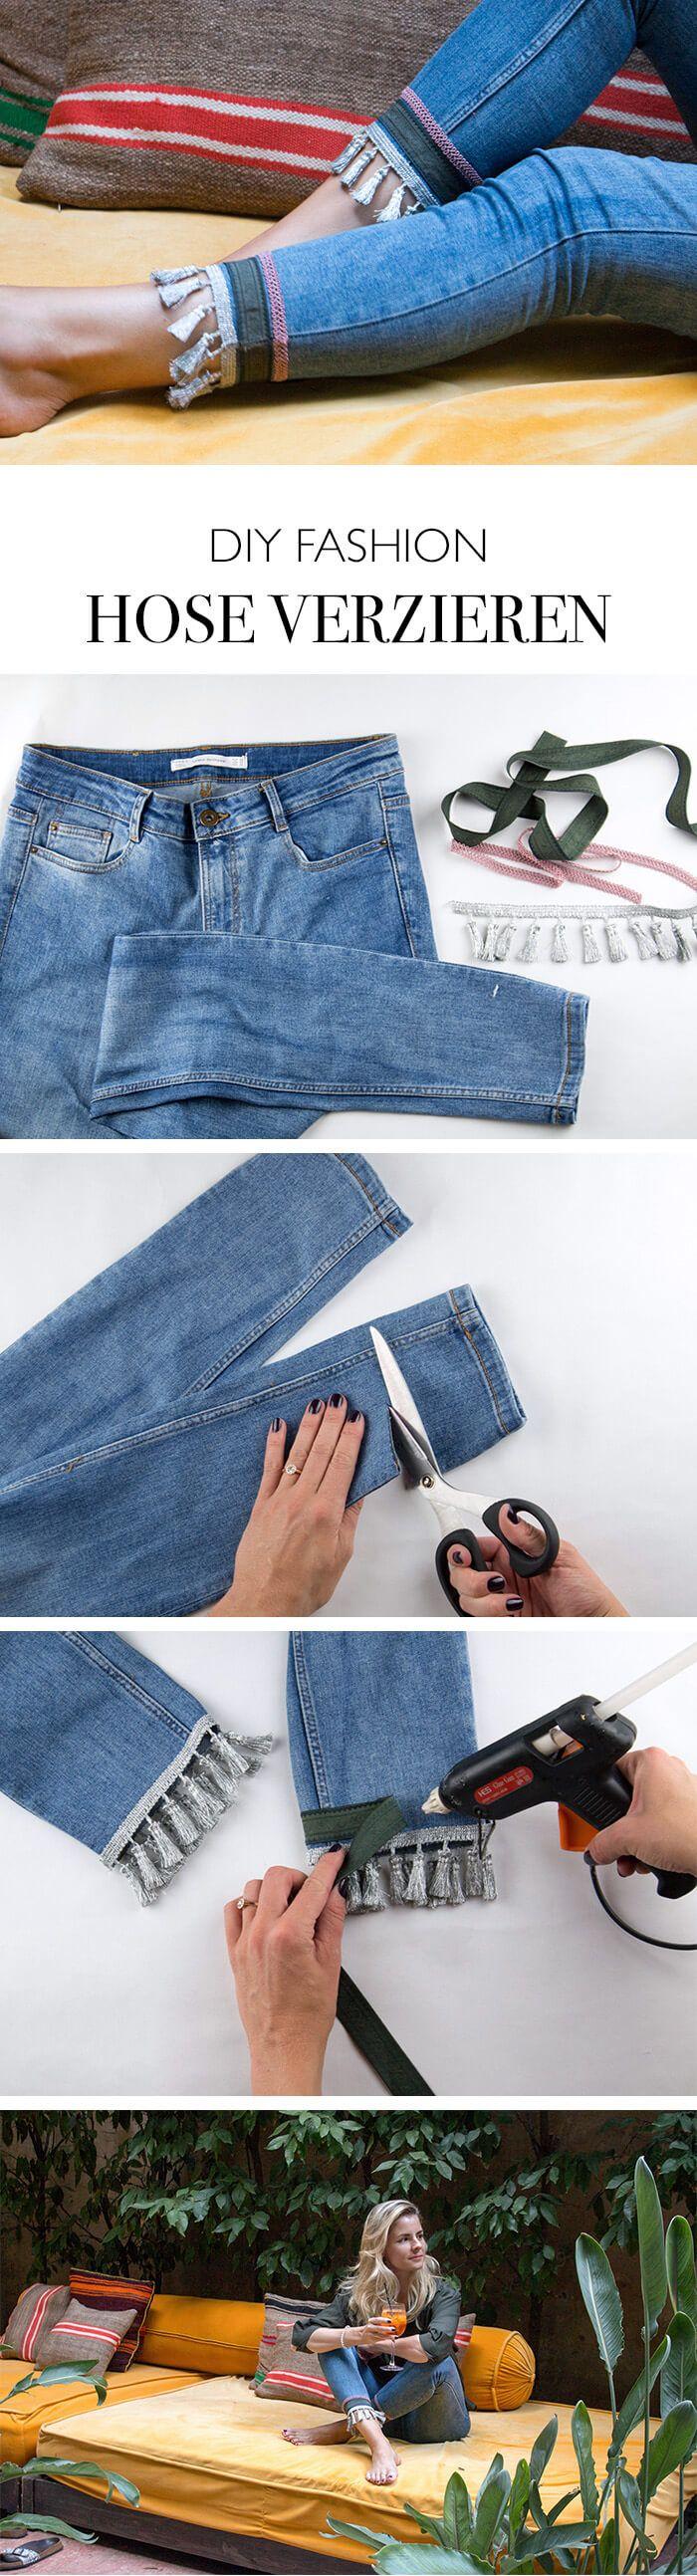 List of Good DIY Clothes from lindaloves.de